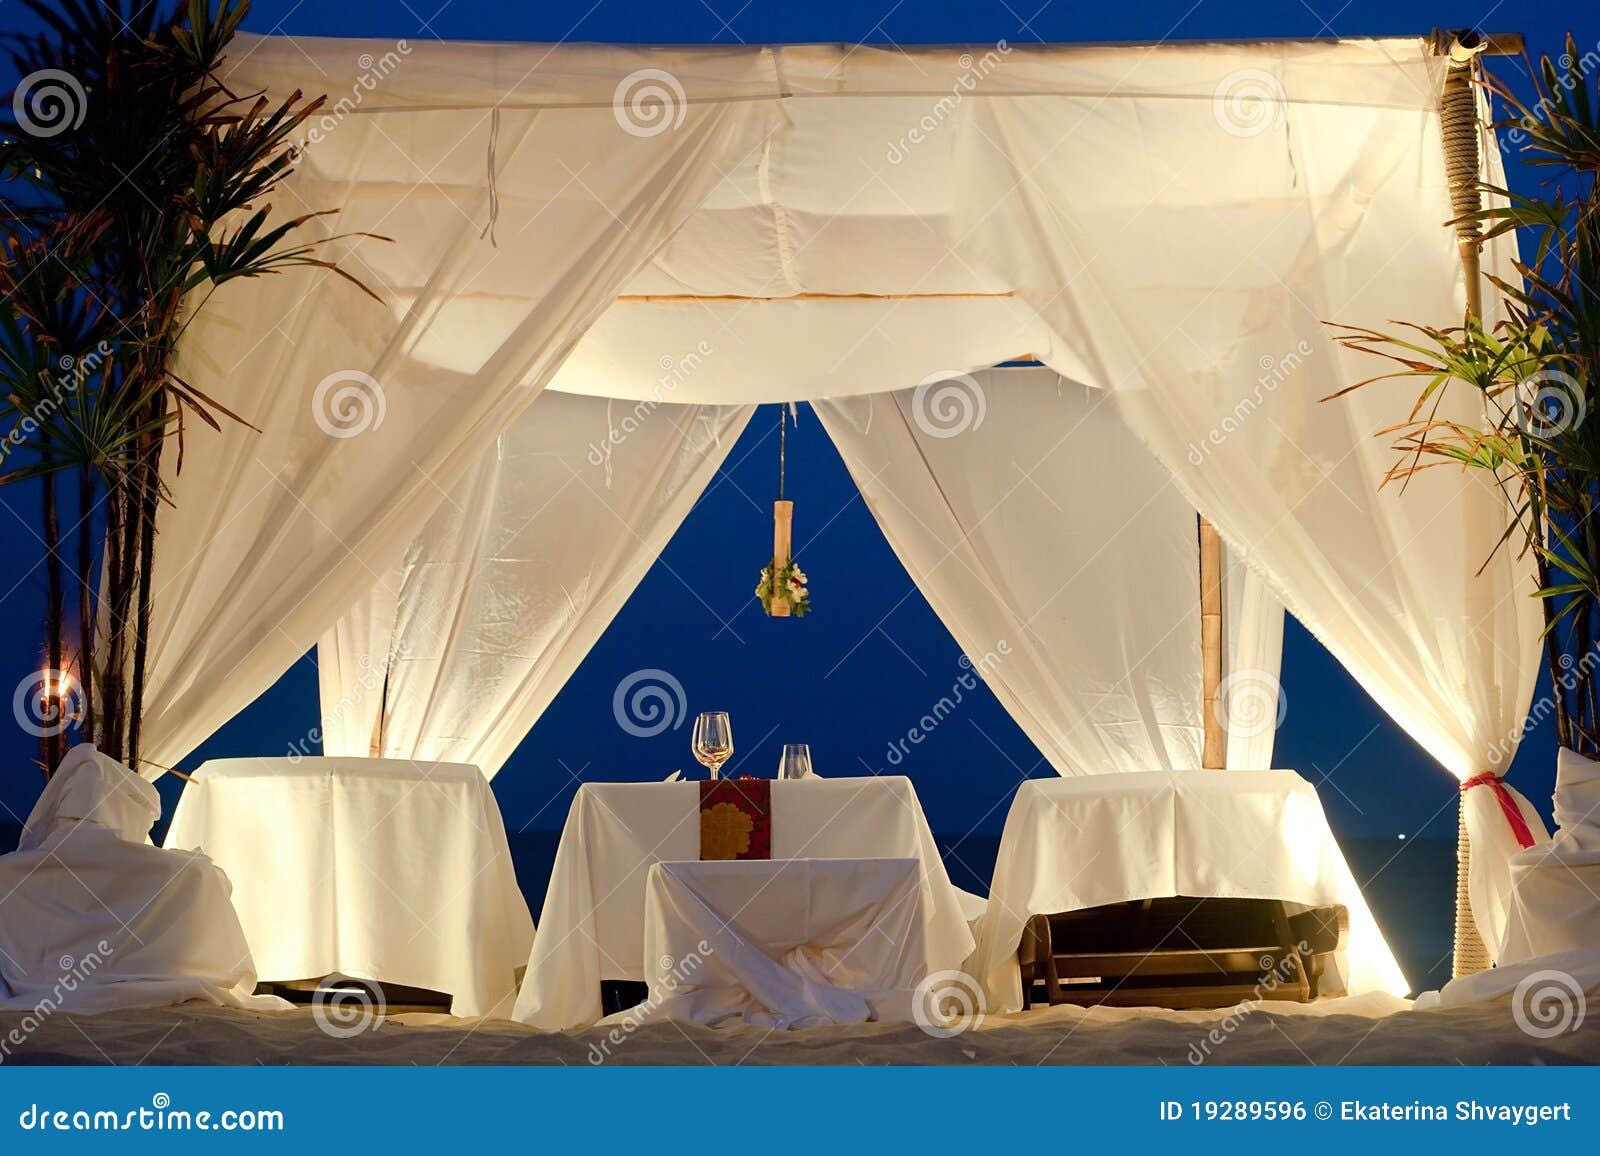 Restaurant Tent On Beach Stock Photo Image Of Restaurant